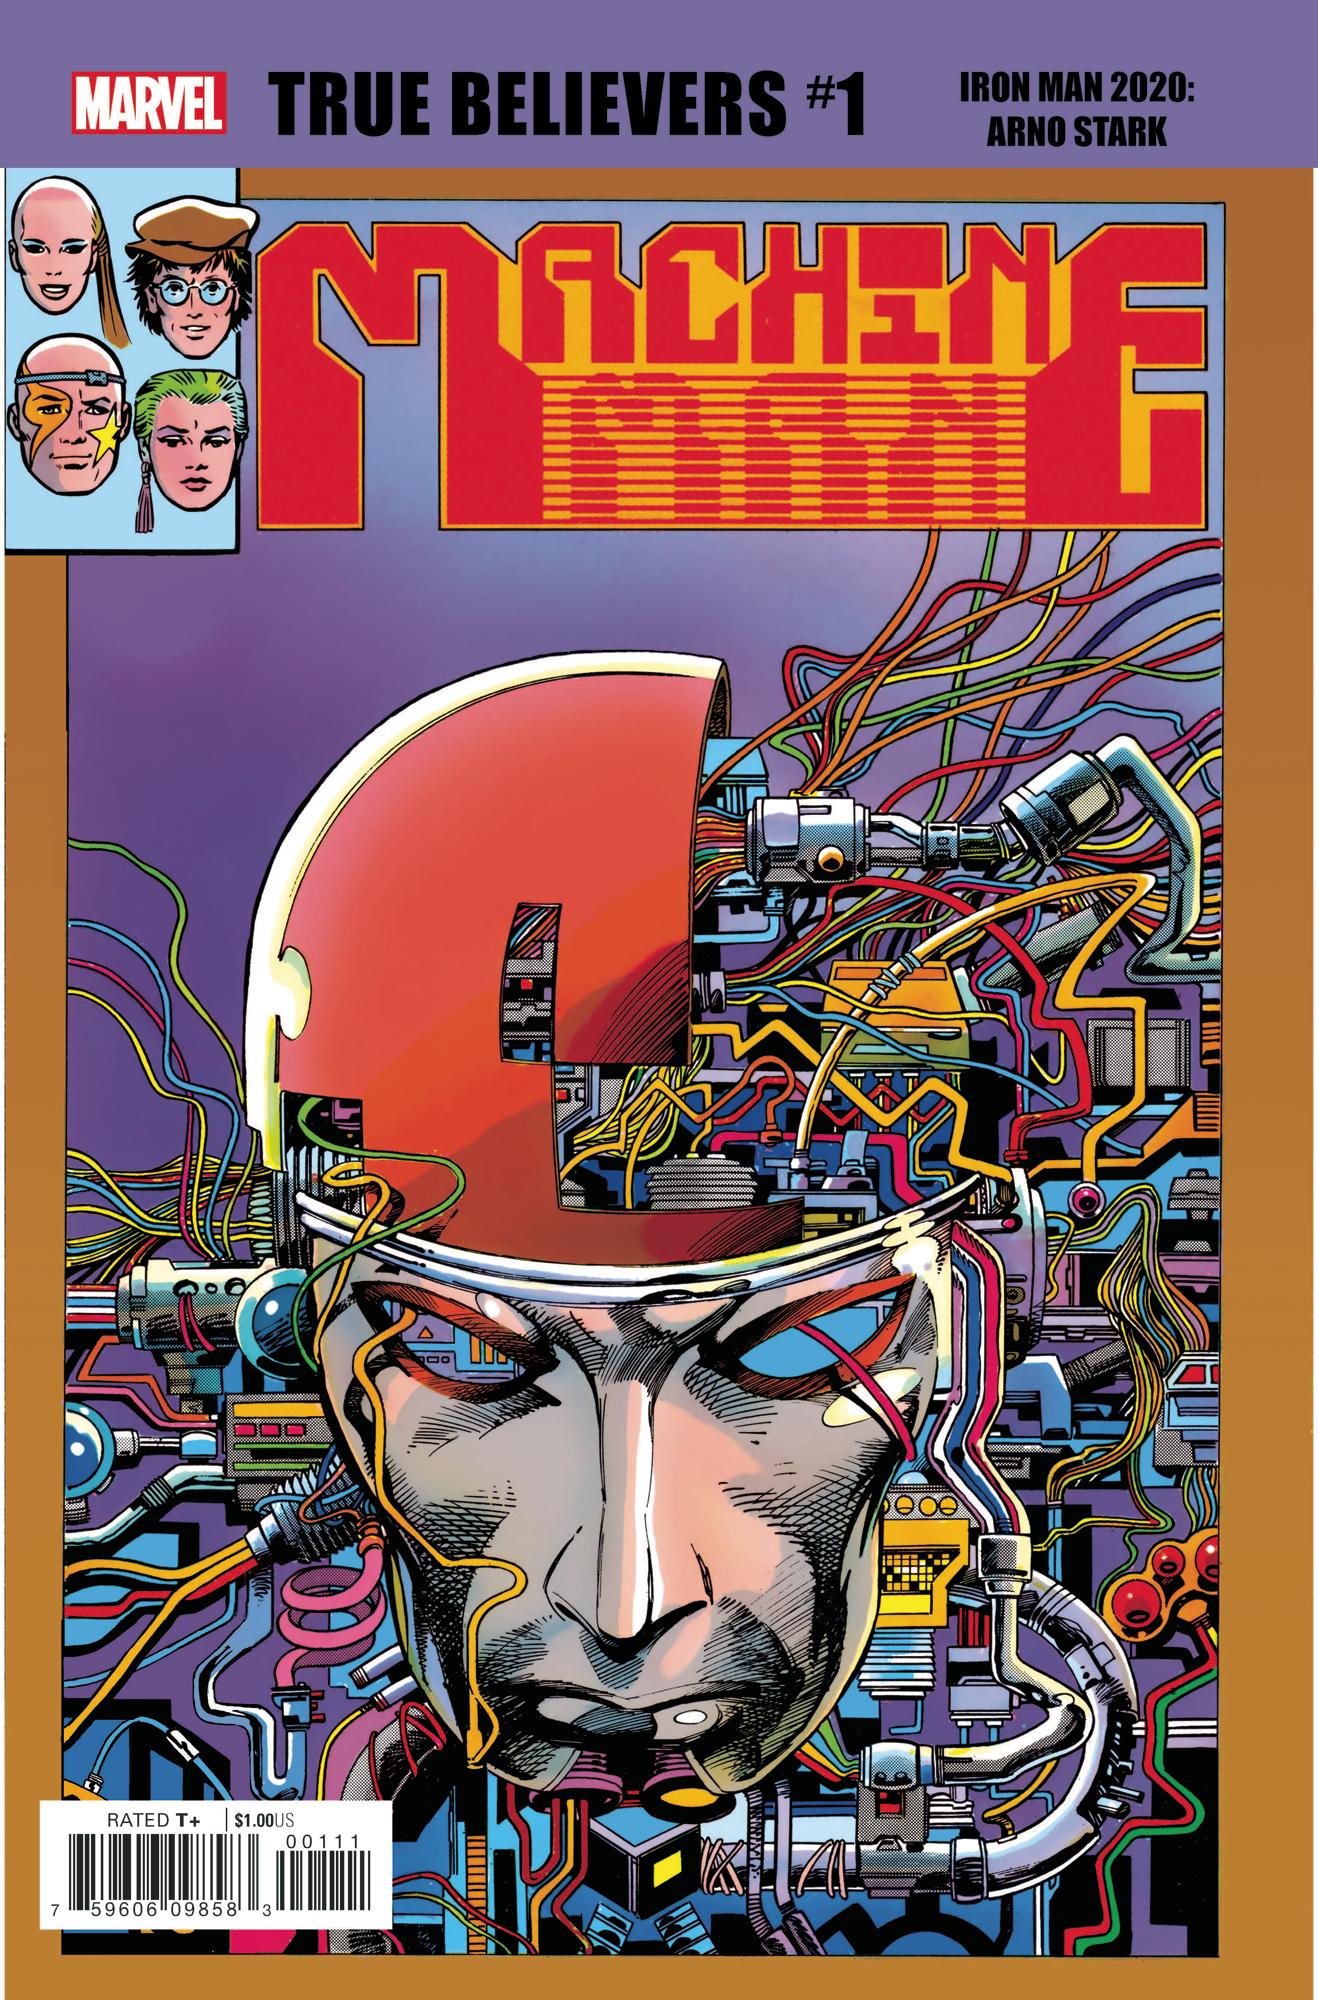 True Believers: Iron Man 2020 - Arno Stark Vol 1 1